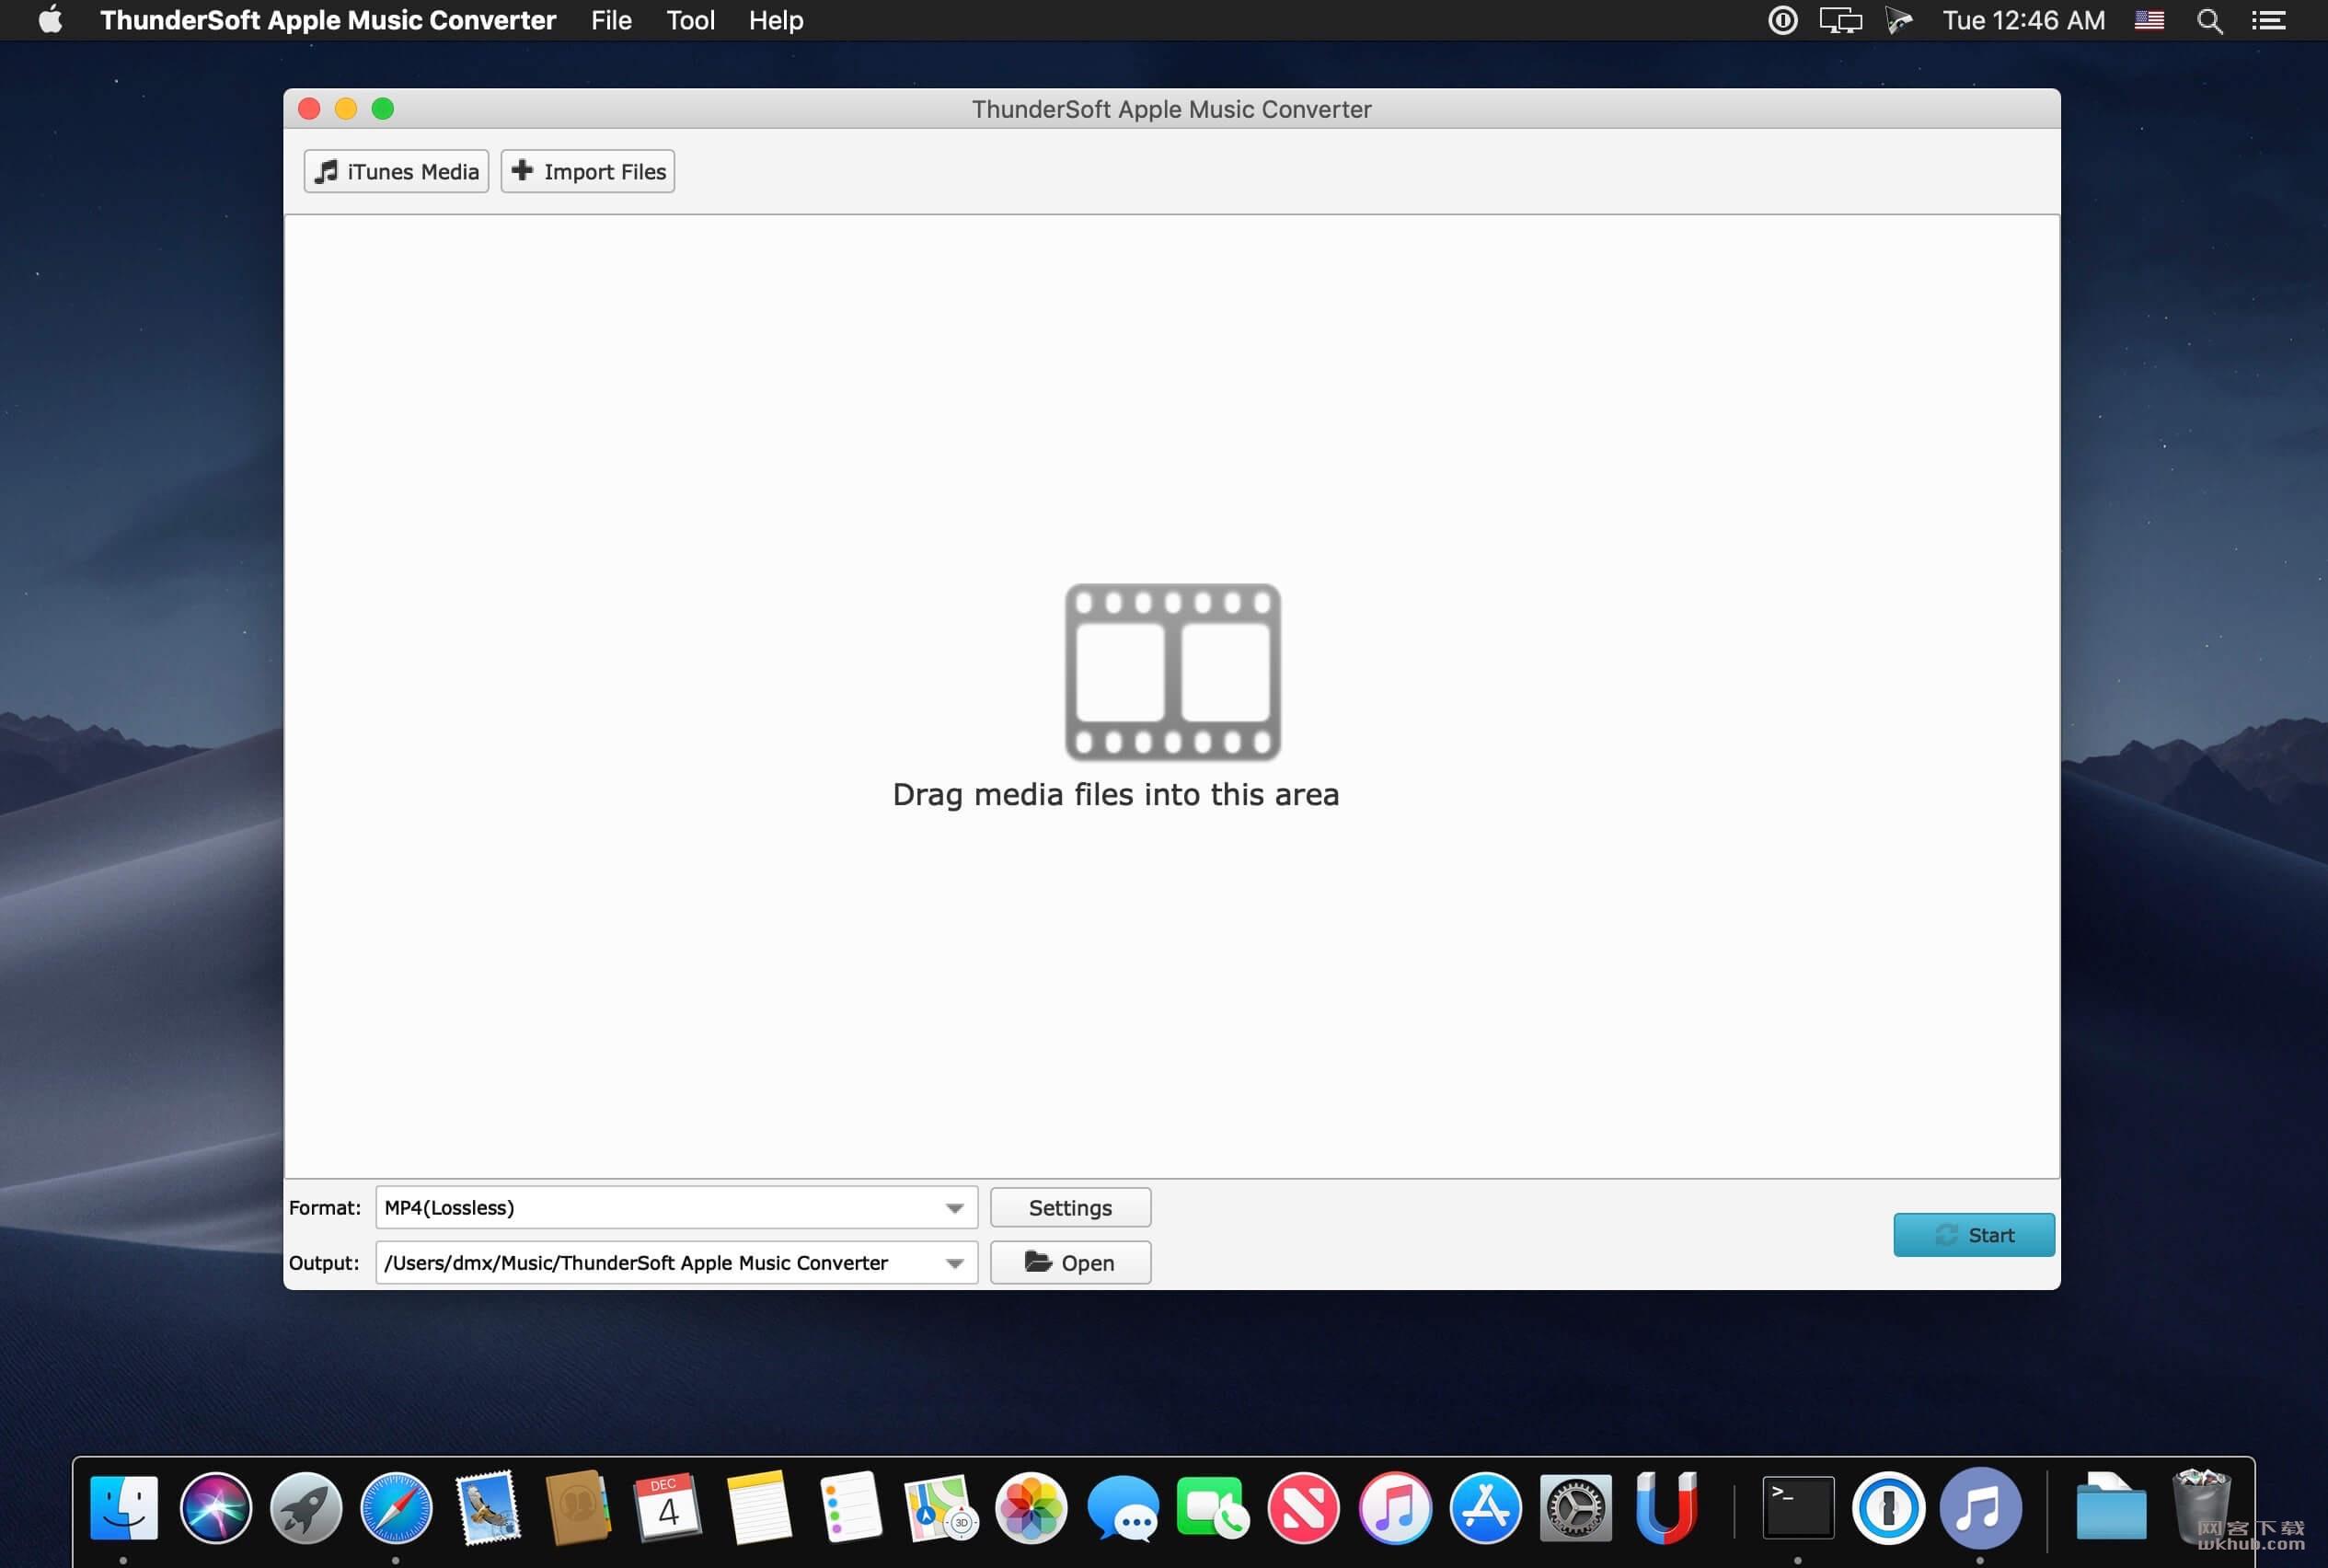 ThunderSoft Apple Music Converter 2.10.6.1882 DRM保护移除工具